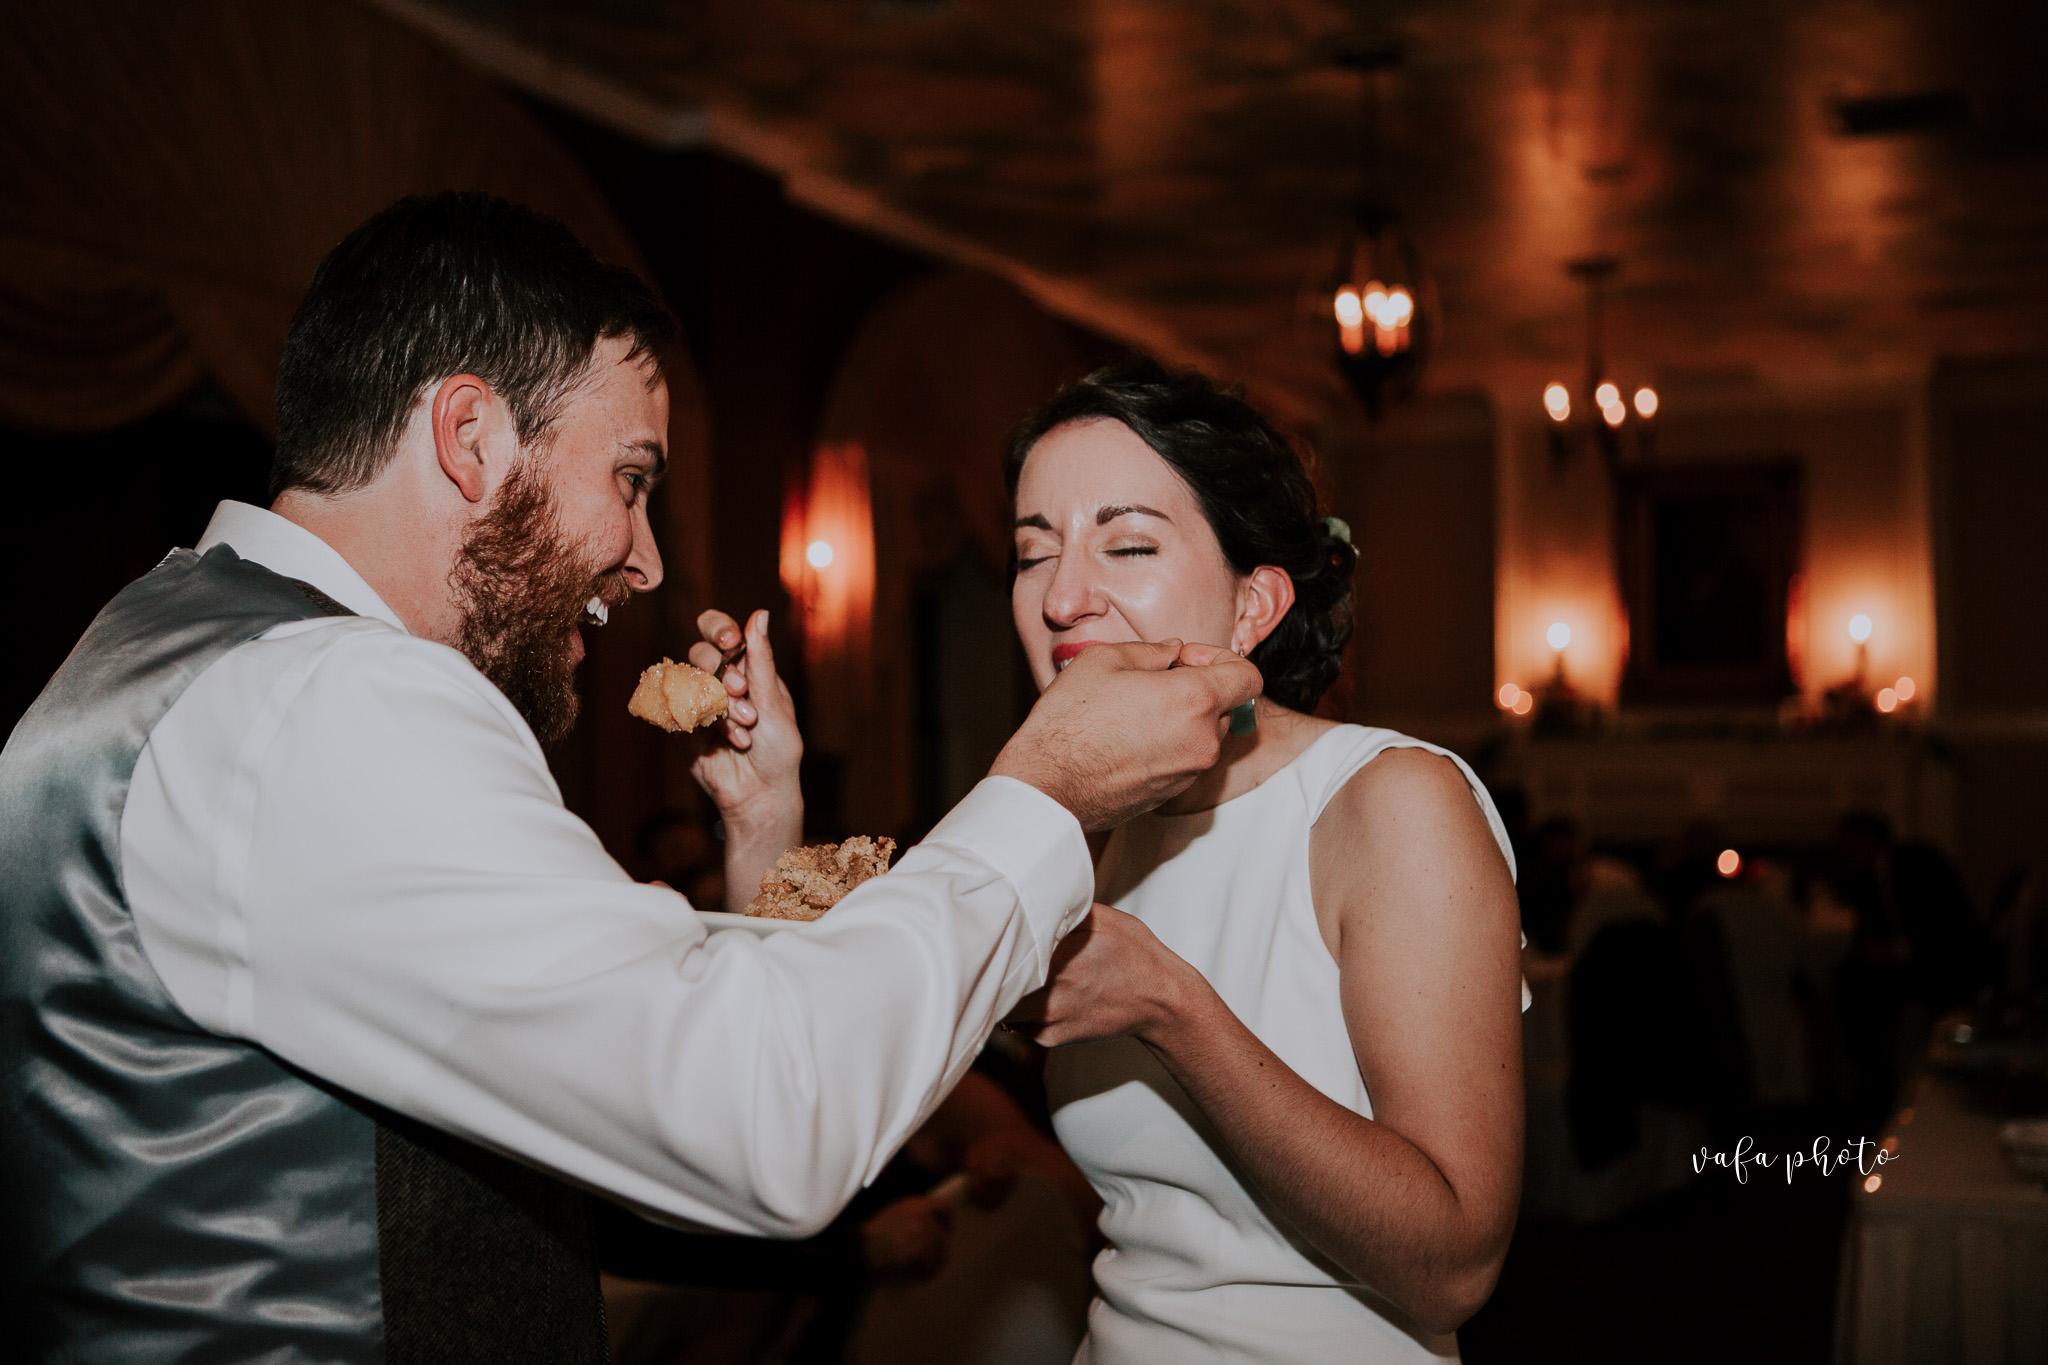 Little-Presque-Isle-Michigan-Wedding-Kim-Kyle-Vafa-Photo-760.jpg